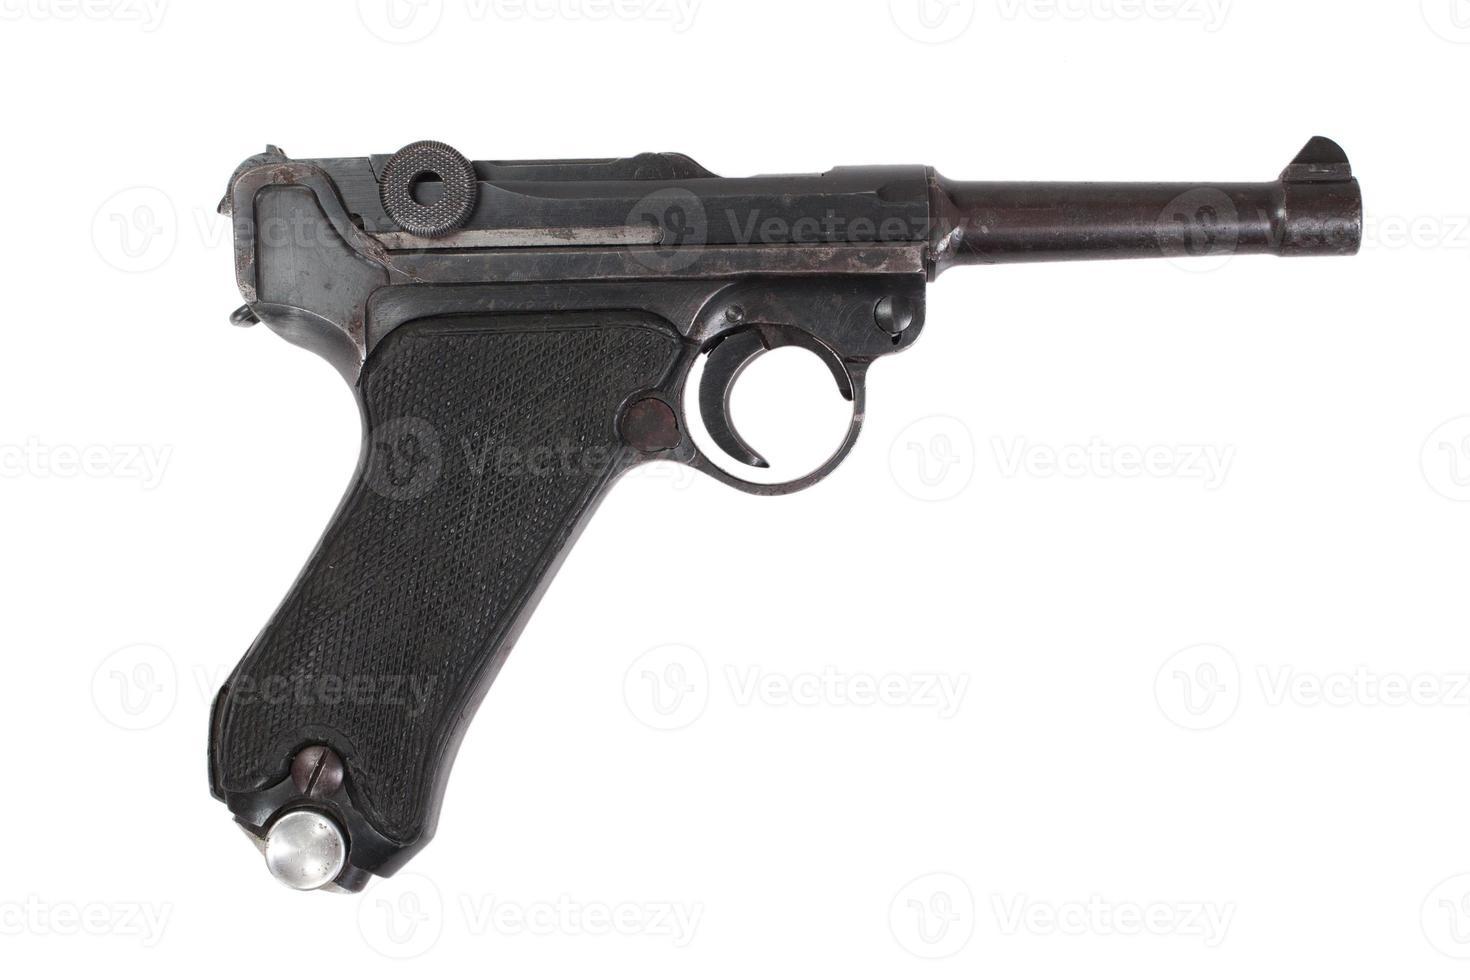 Luger p08 parabellum pistola aislado foto